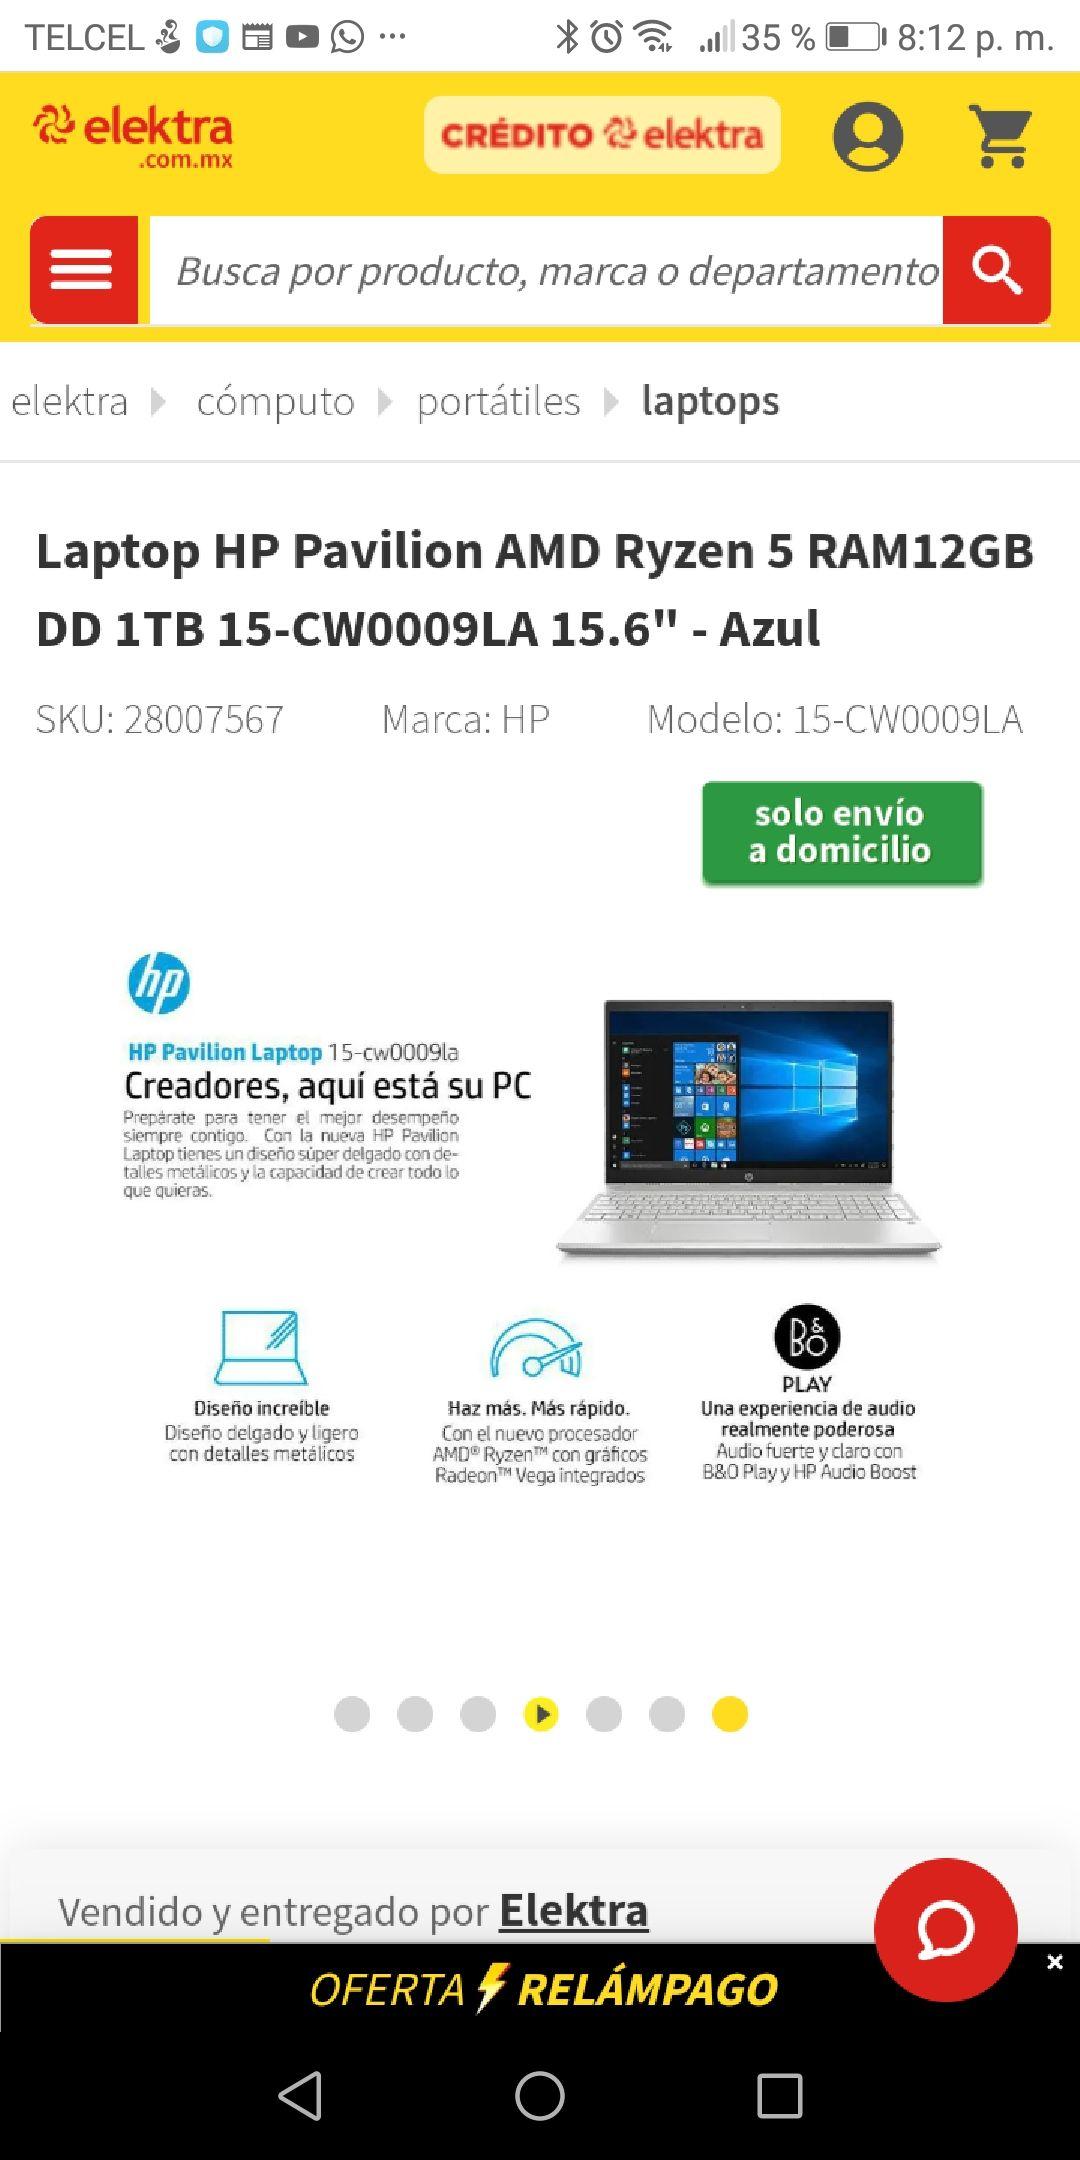 "Elektra: Laptop HP Pavilion AMD Ryzen 5 RAM12GB DD 1TB 15-CW0009LA 15.6"" - Azul (Pagando con Citipay)"